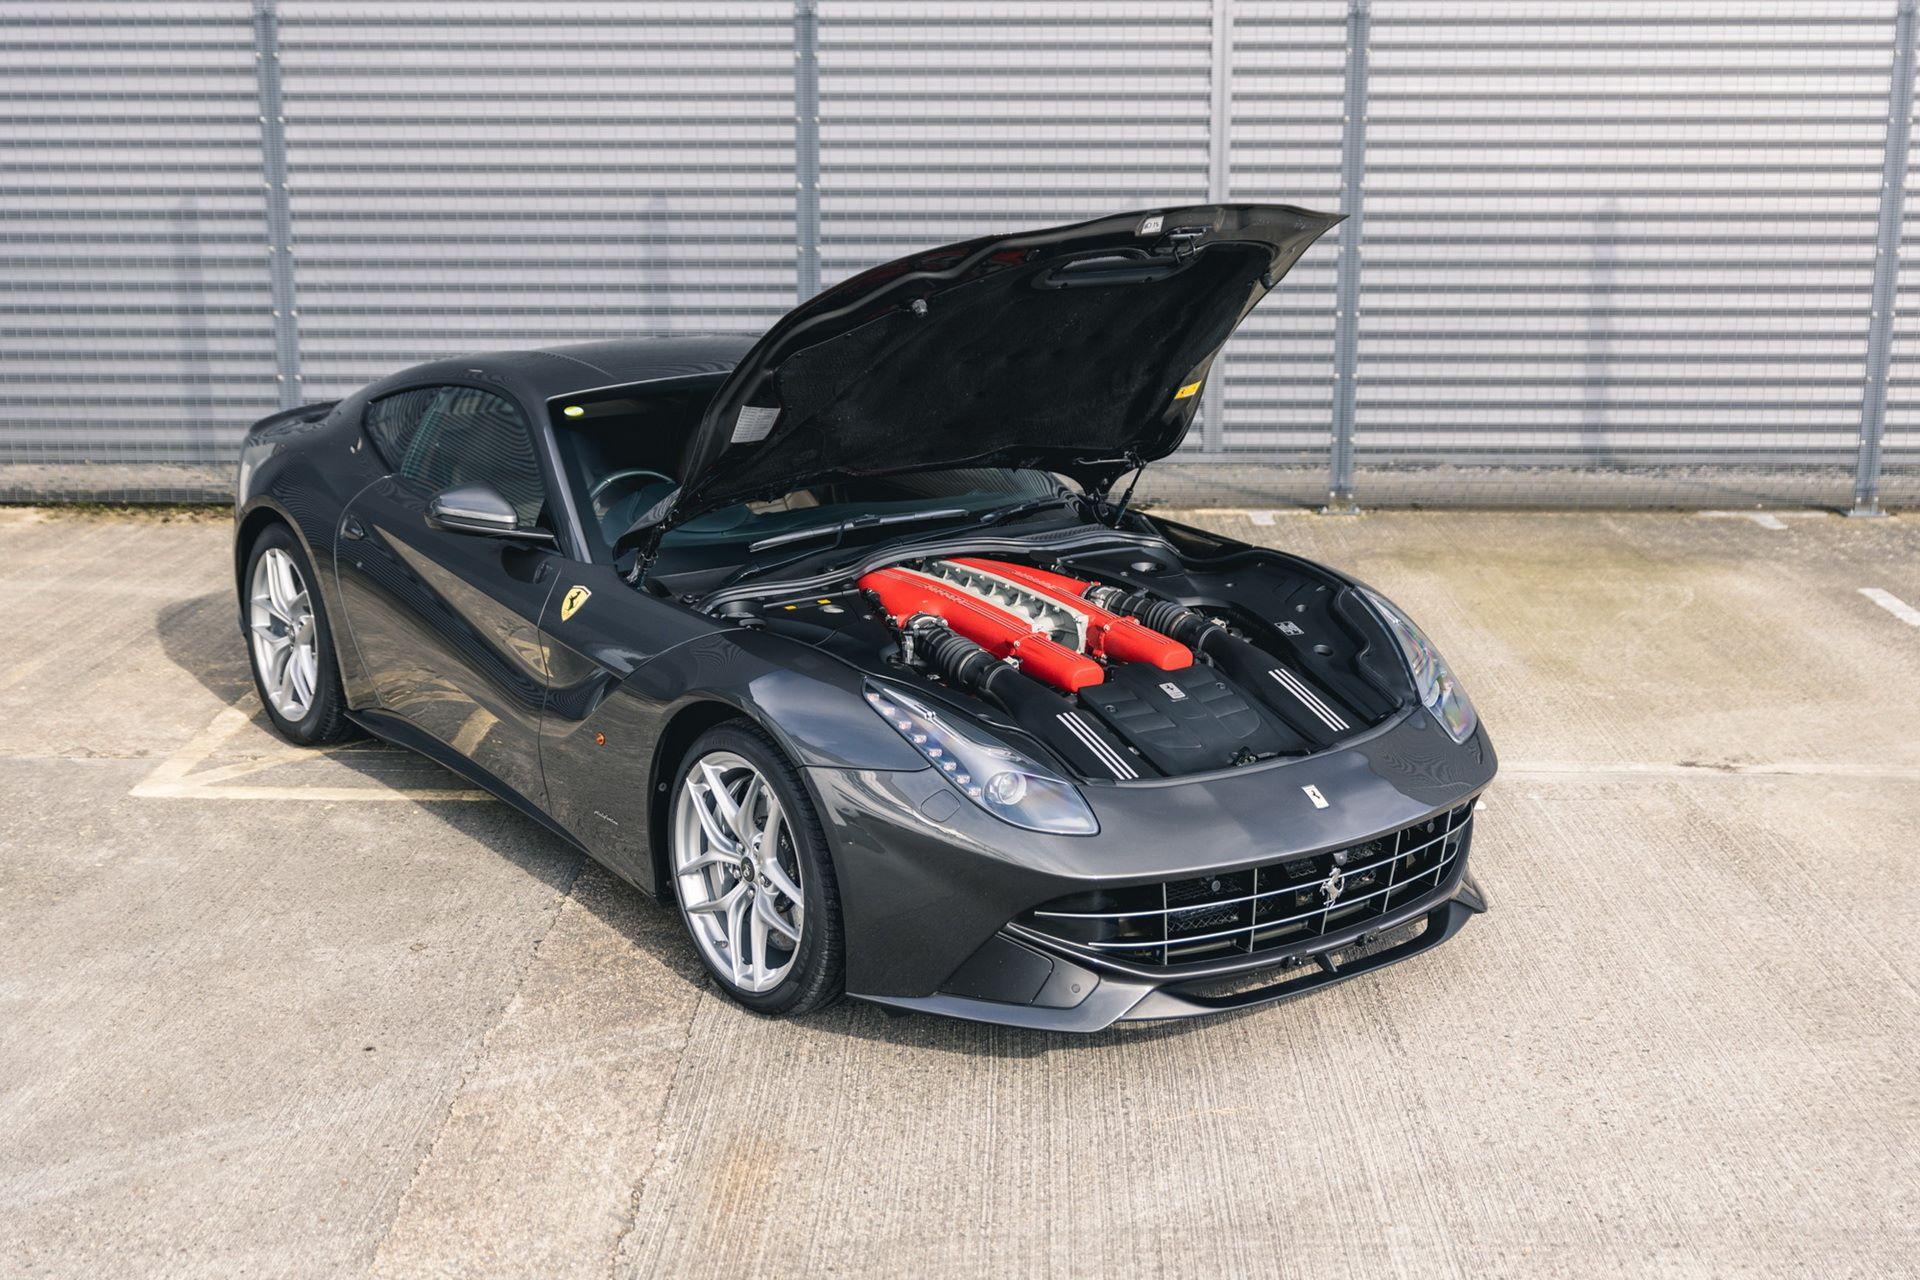 Ferrari-F12berlinetta-Chris-Harris-5